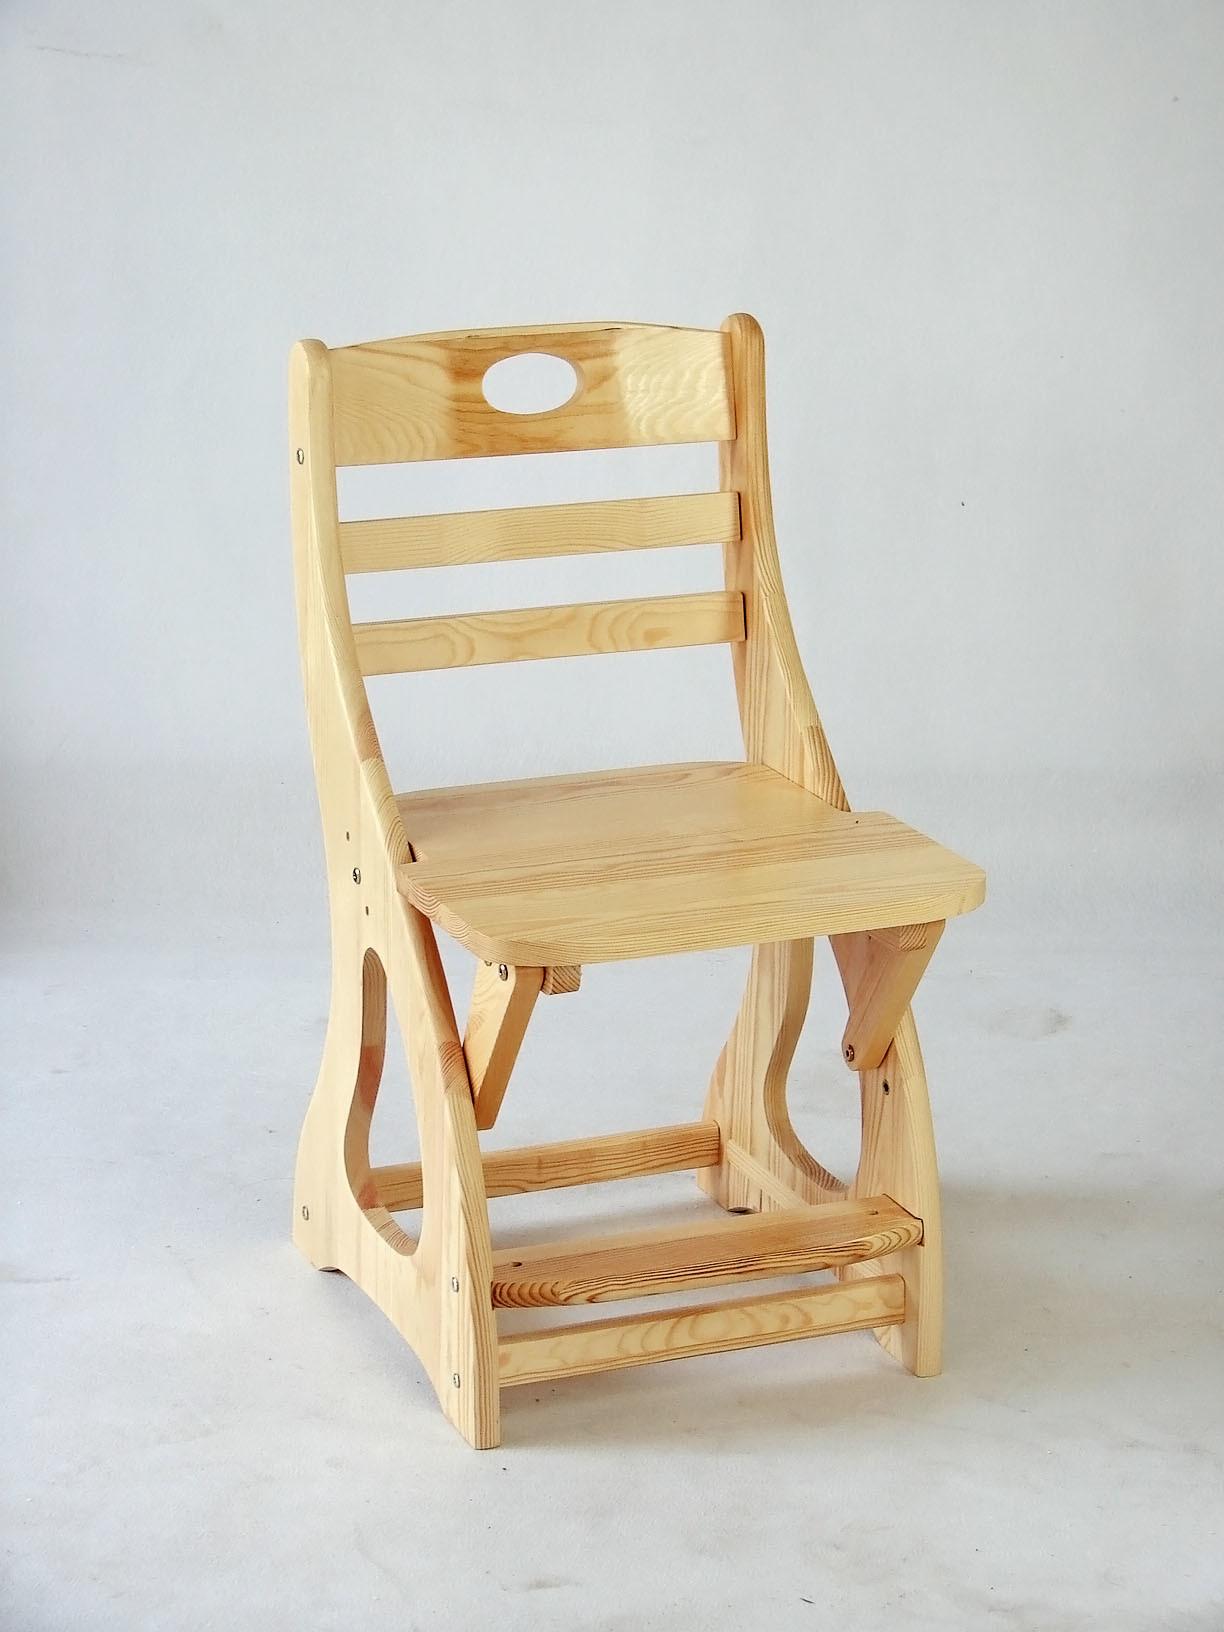 Silla fuerte plegable silla de madera de la silla de for Sillas para planos